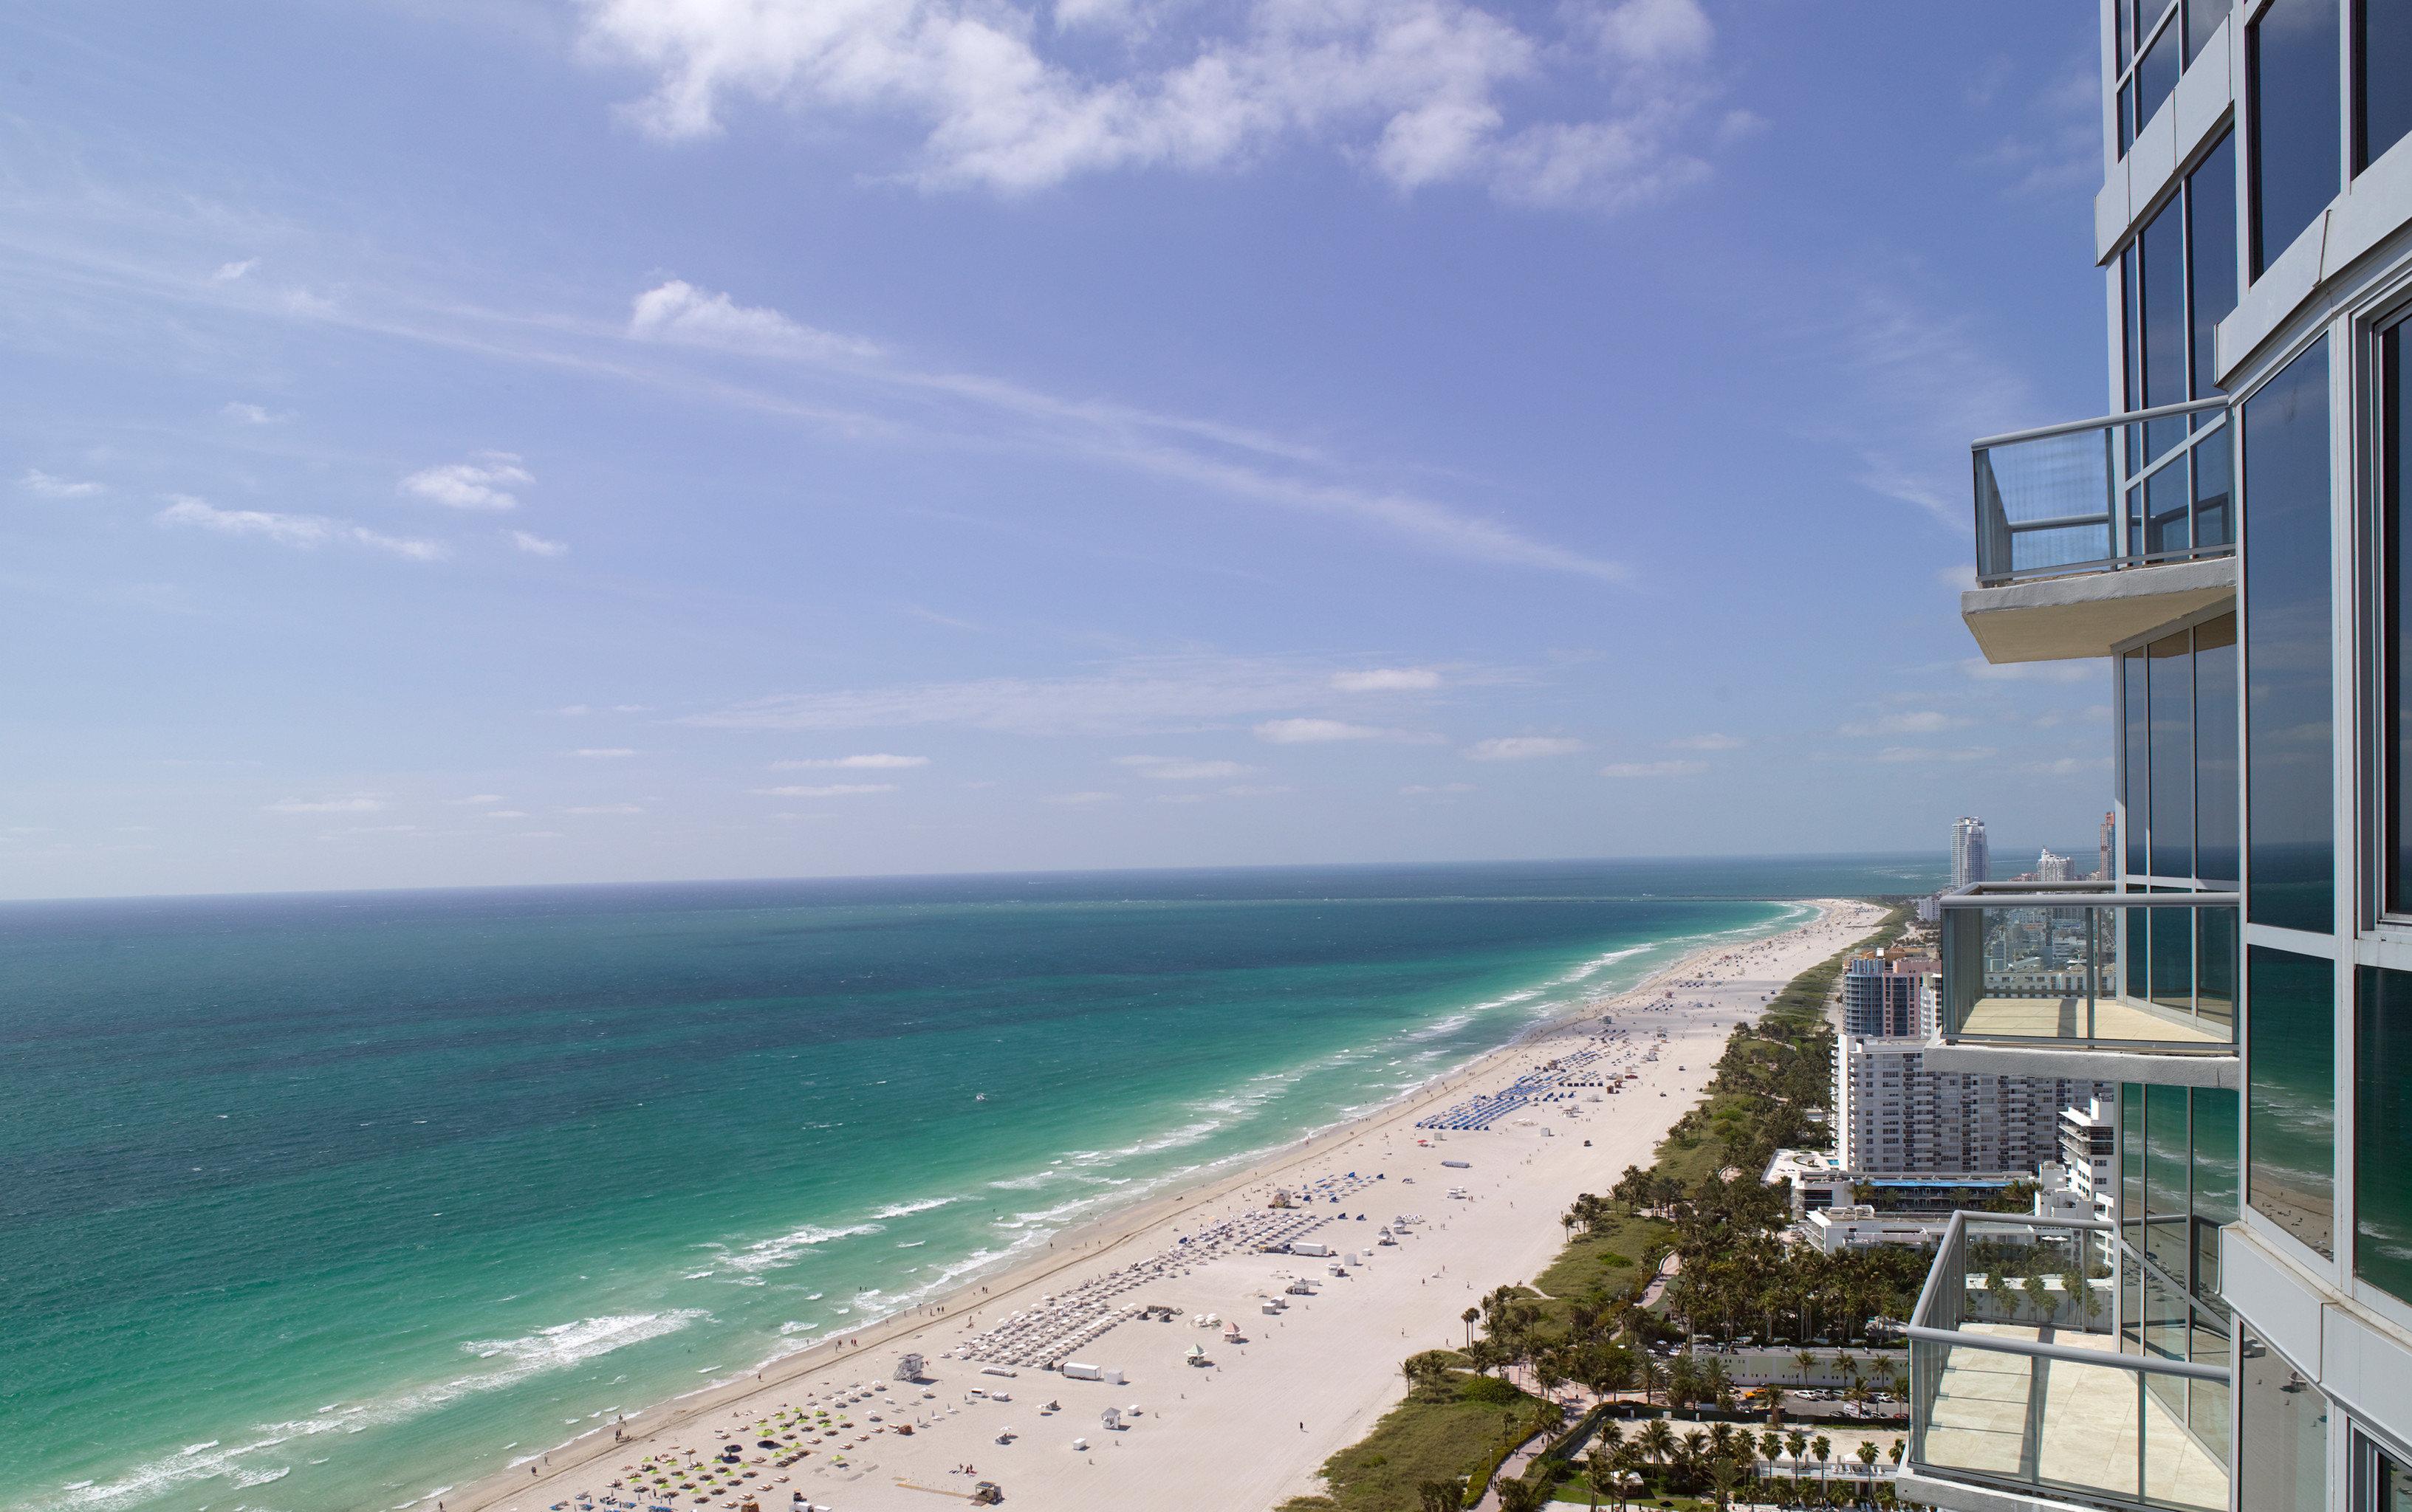 Beach Beachfront Ocean sky water Coast Sea Nature horizon shore caribbean cape tower walkway overlooking sandy